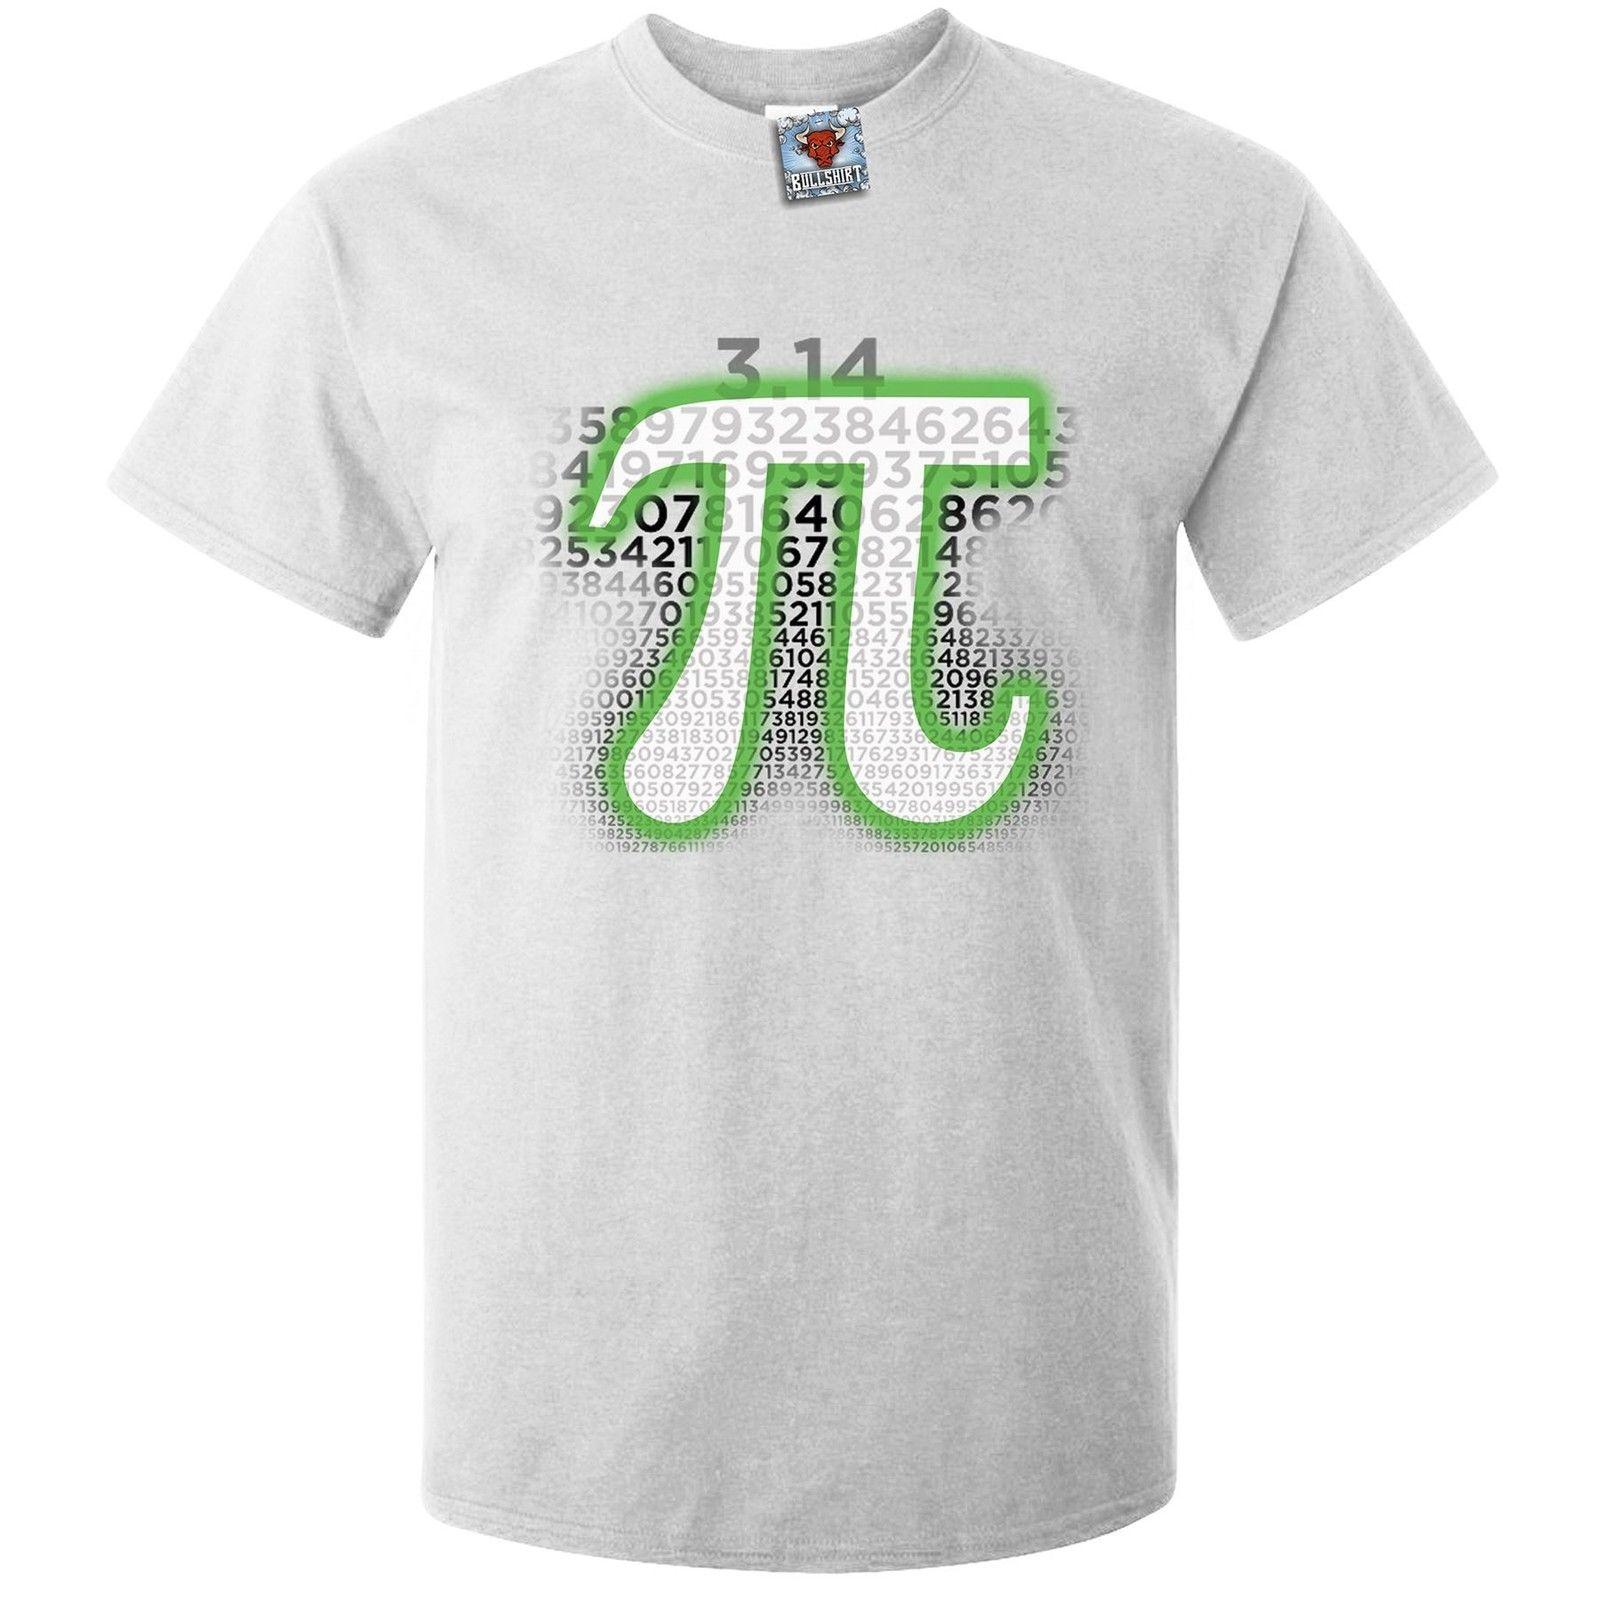 Glowing Pi T-shirt - T shirt nerd maths physics funny joke